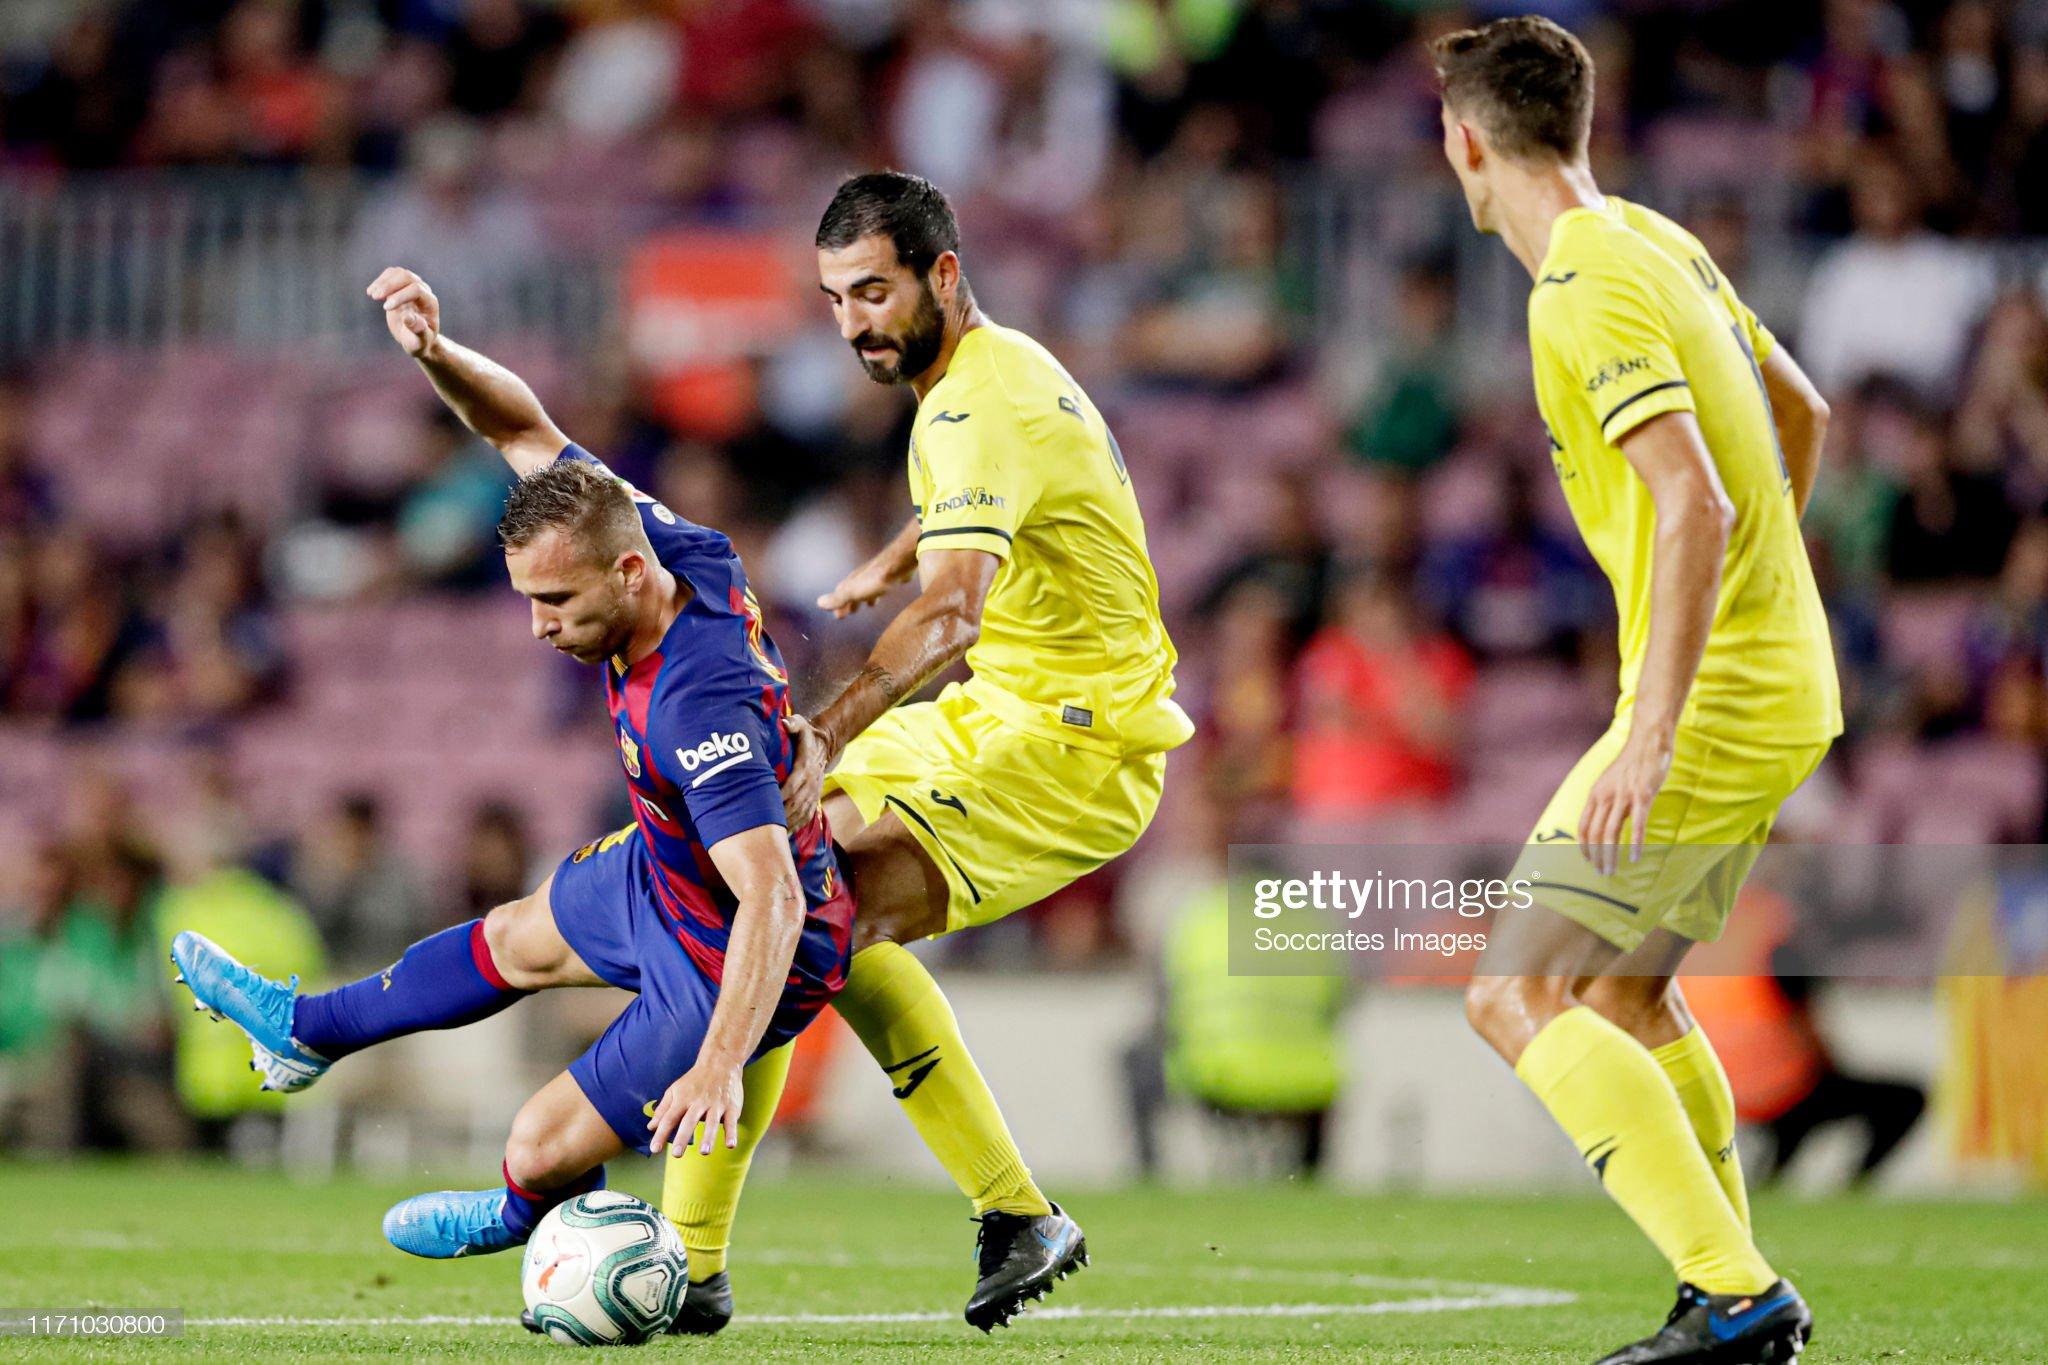 صور مباراة : برشلونة - فياريال 2-1 ( 24-09-2019 )  Arthur-of-fc-barcelona-raul-albiol-of-villarreal-during-the-la-liga-picture-id1171030800?s=2048x2048